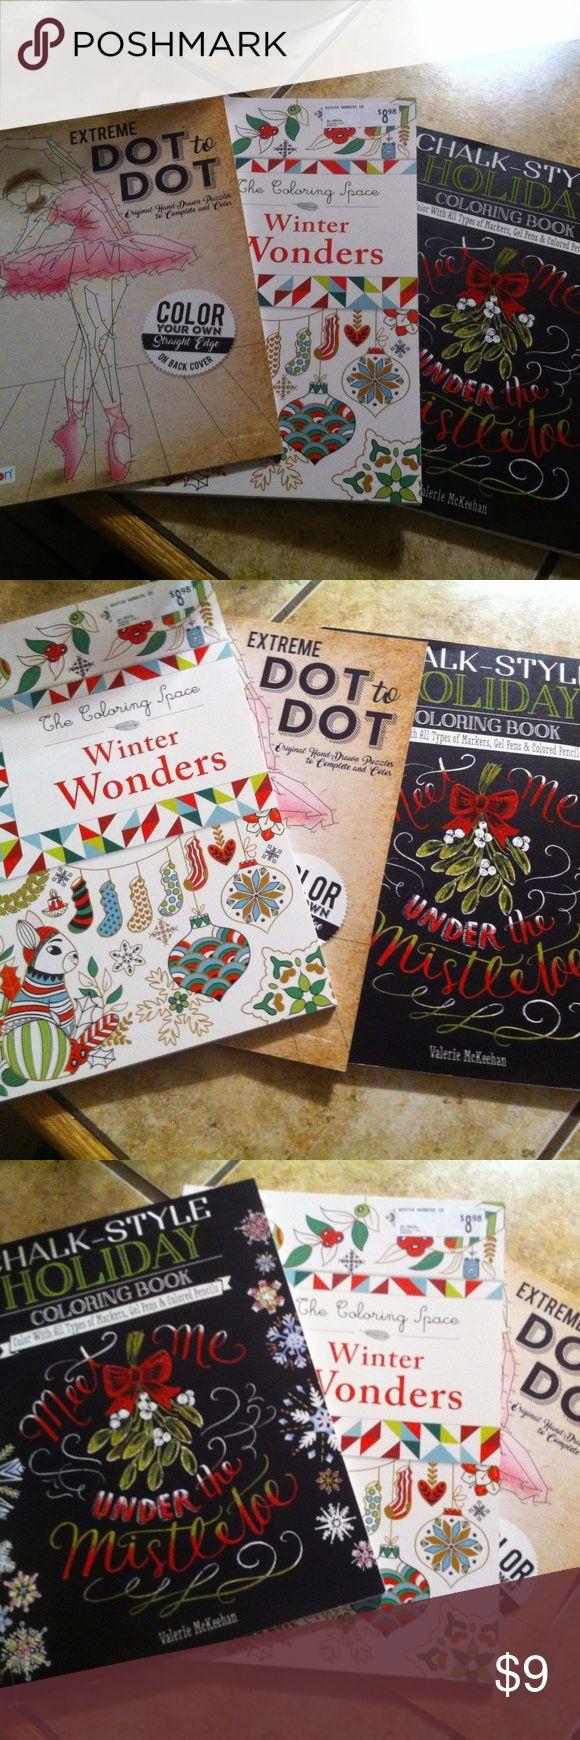 best 25 dot to dot books ideas on pinterest dot to dot dot to